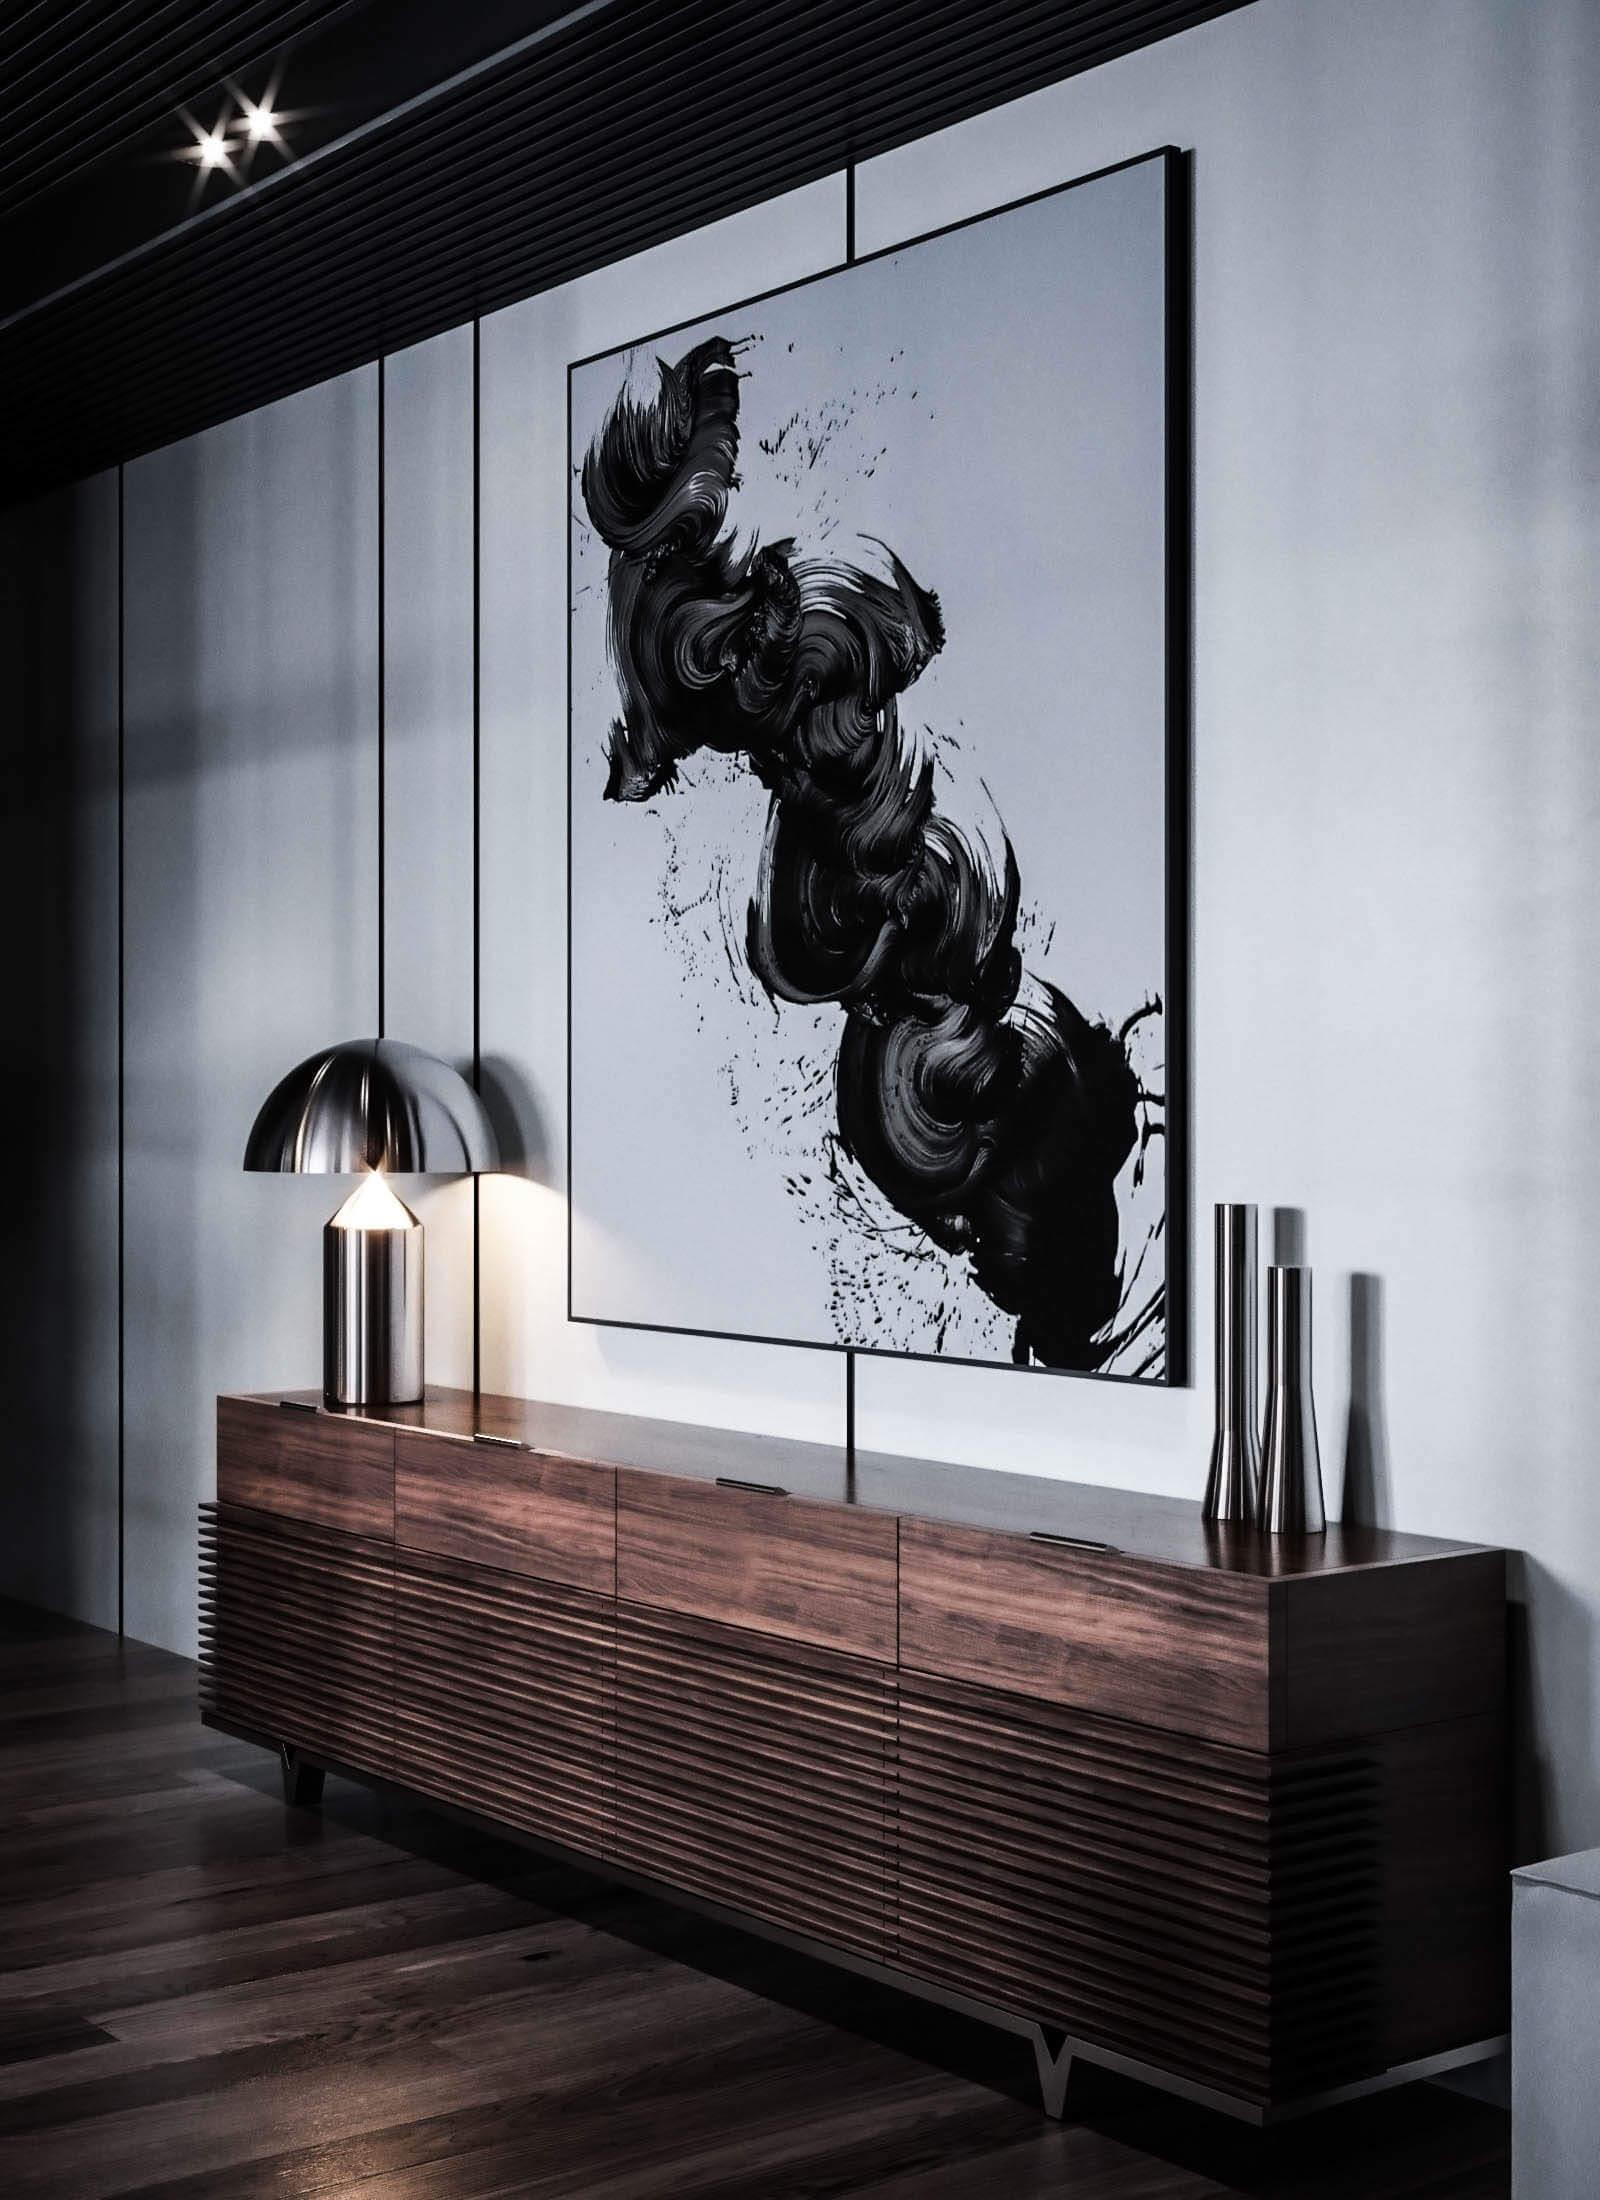 Dubrovka apartment sideboard 3 - cgi visualizatiomn